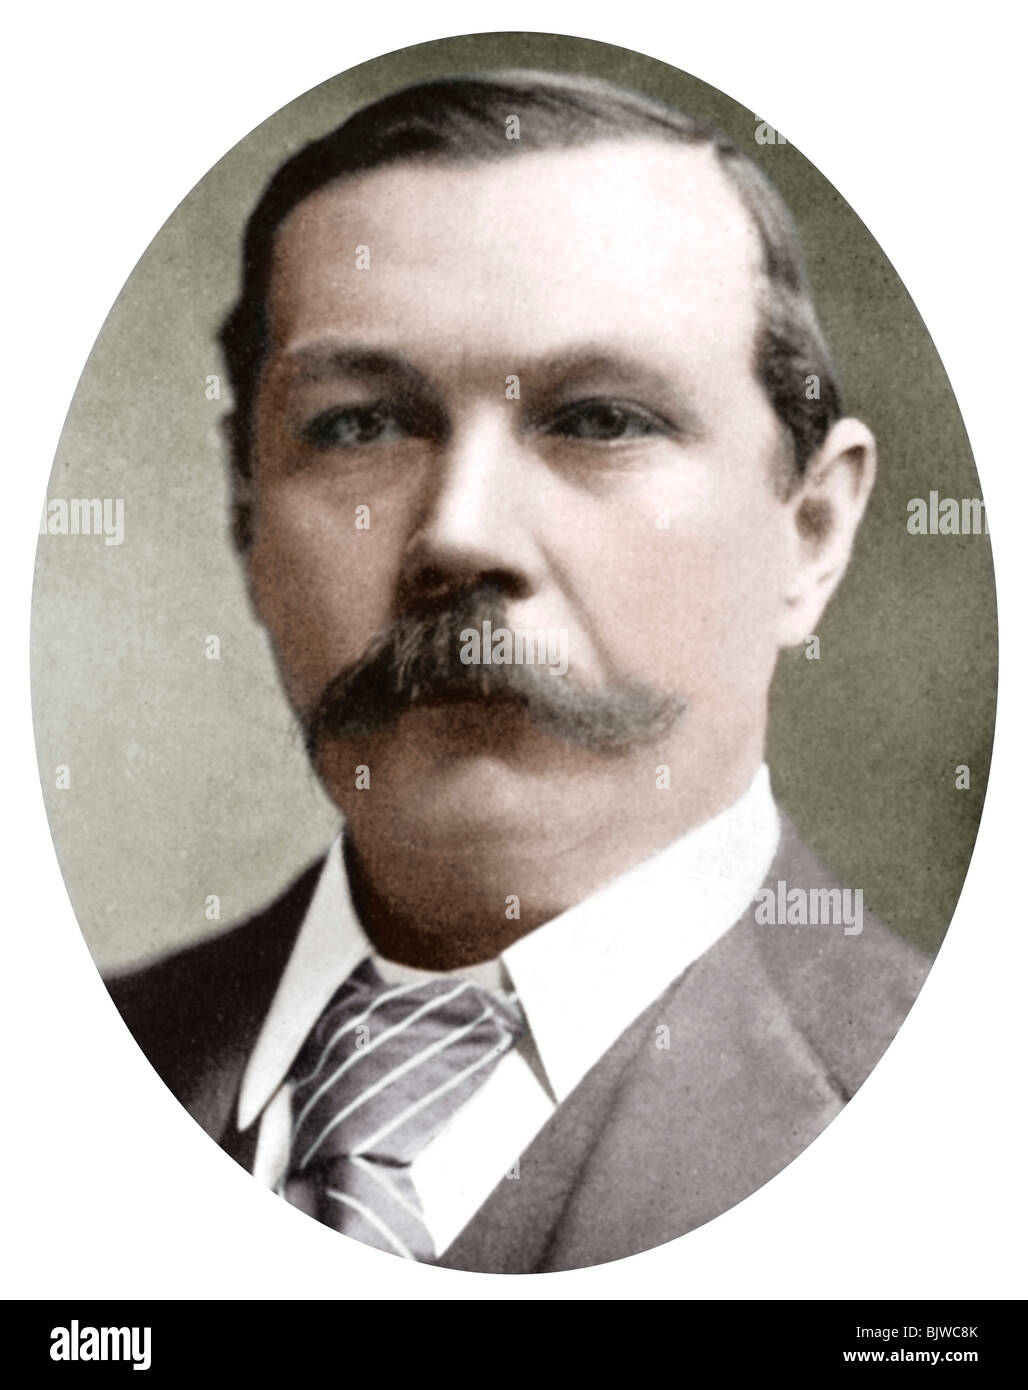 Arthur Conan Doyle, Scottish writer, c1900. - Stock Image